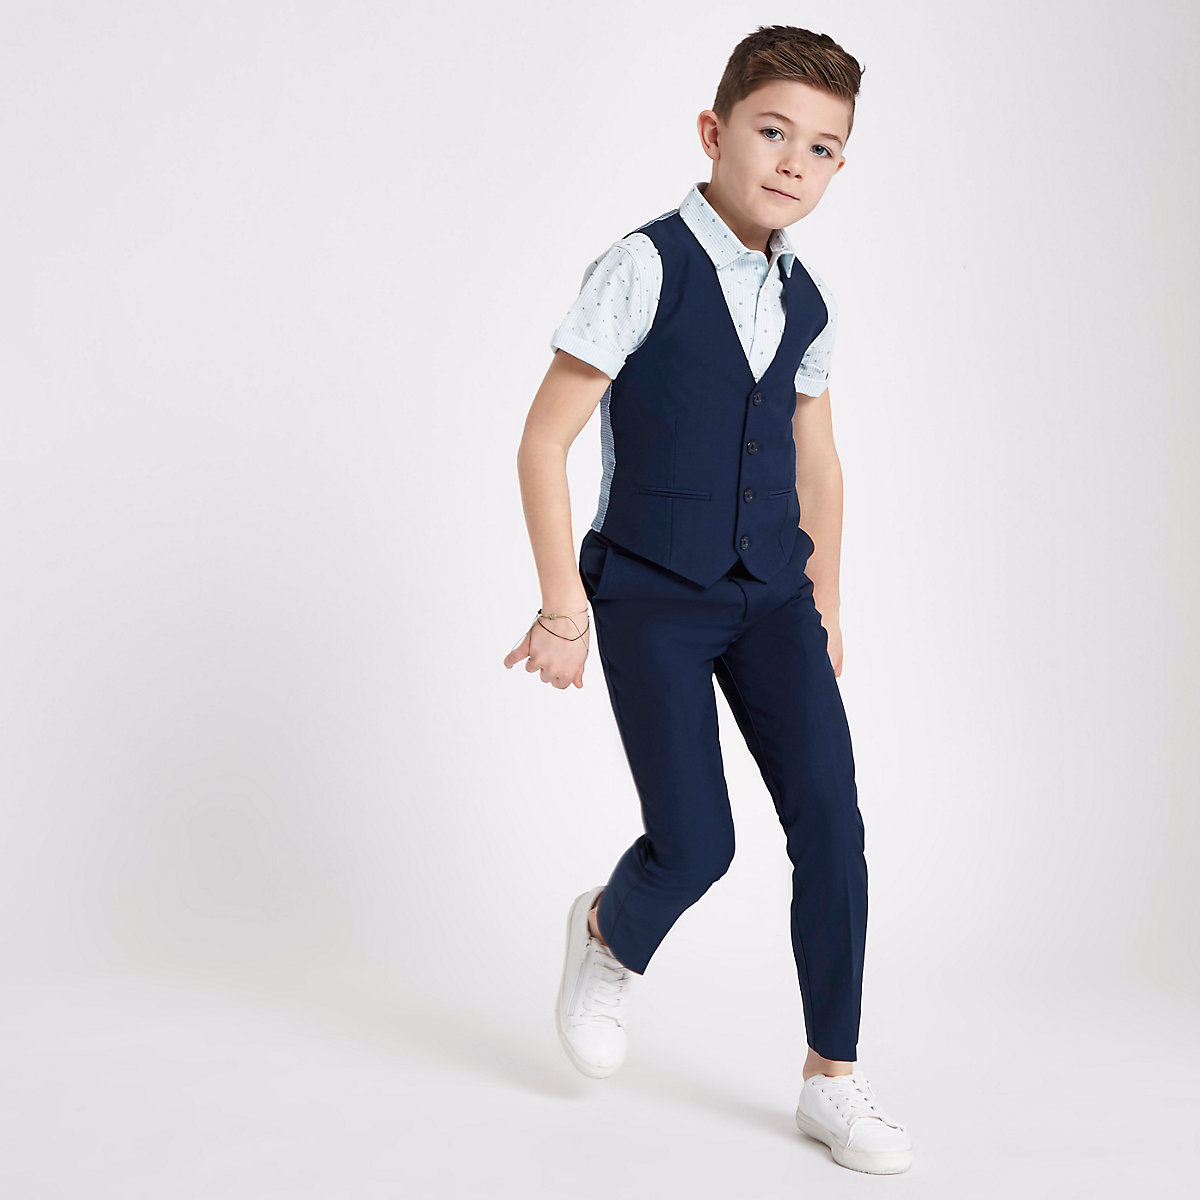 Gilet de costume bleu marine pour garçon